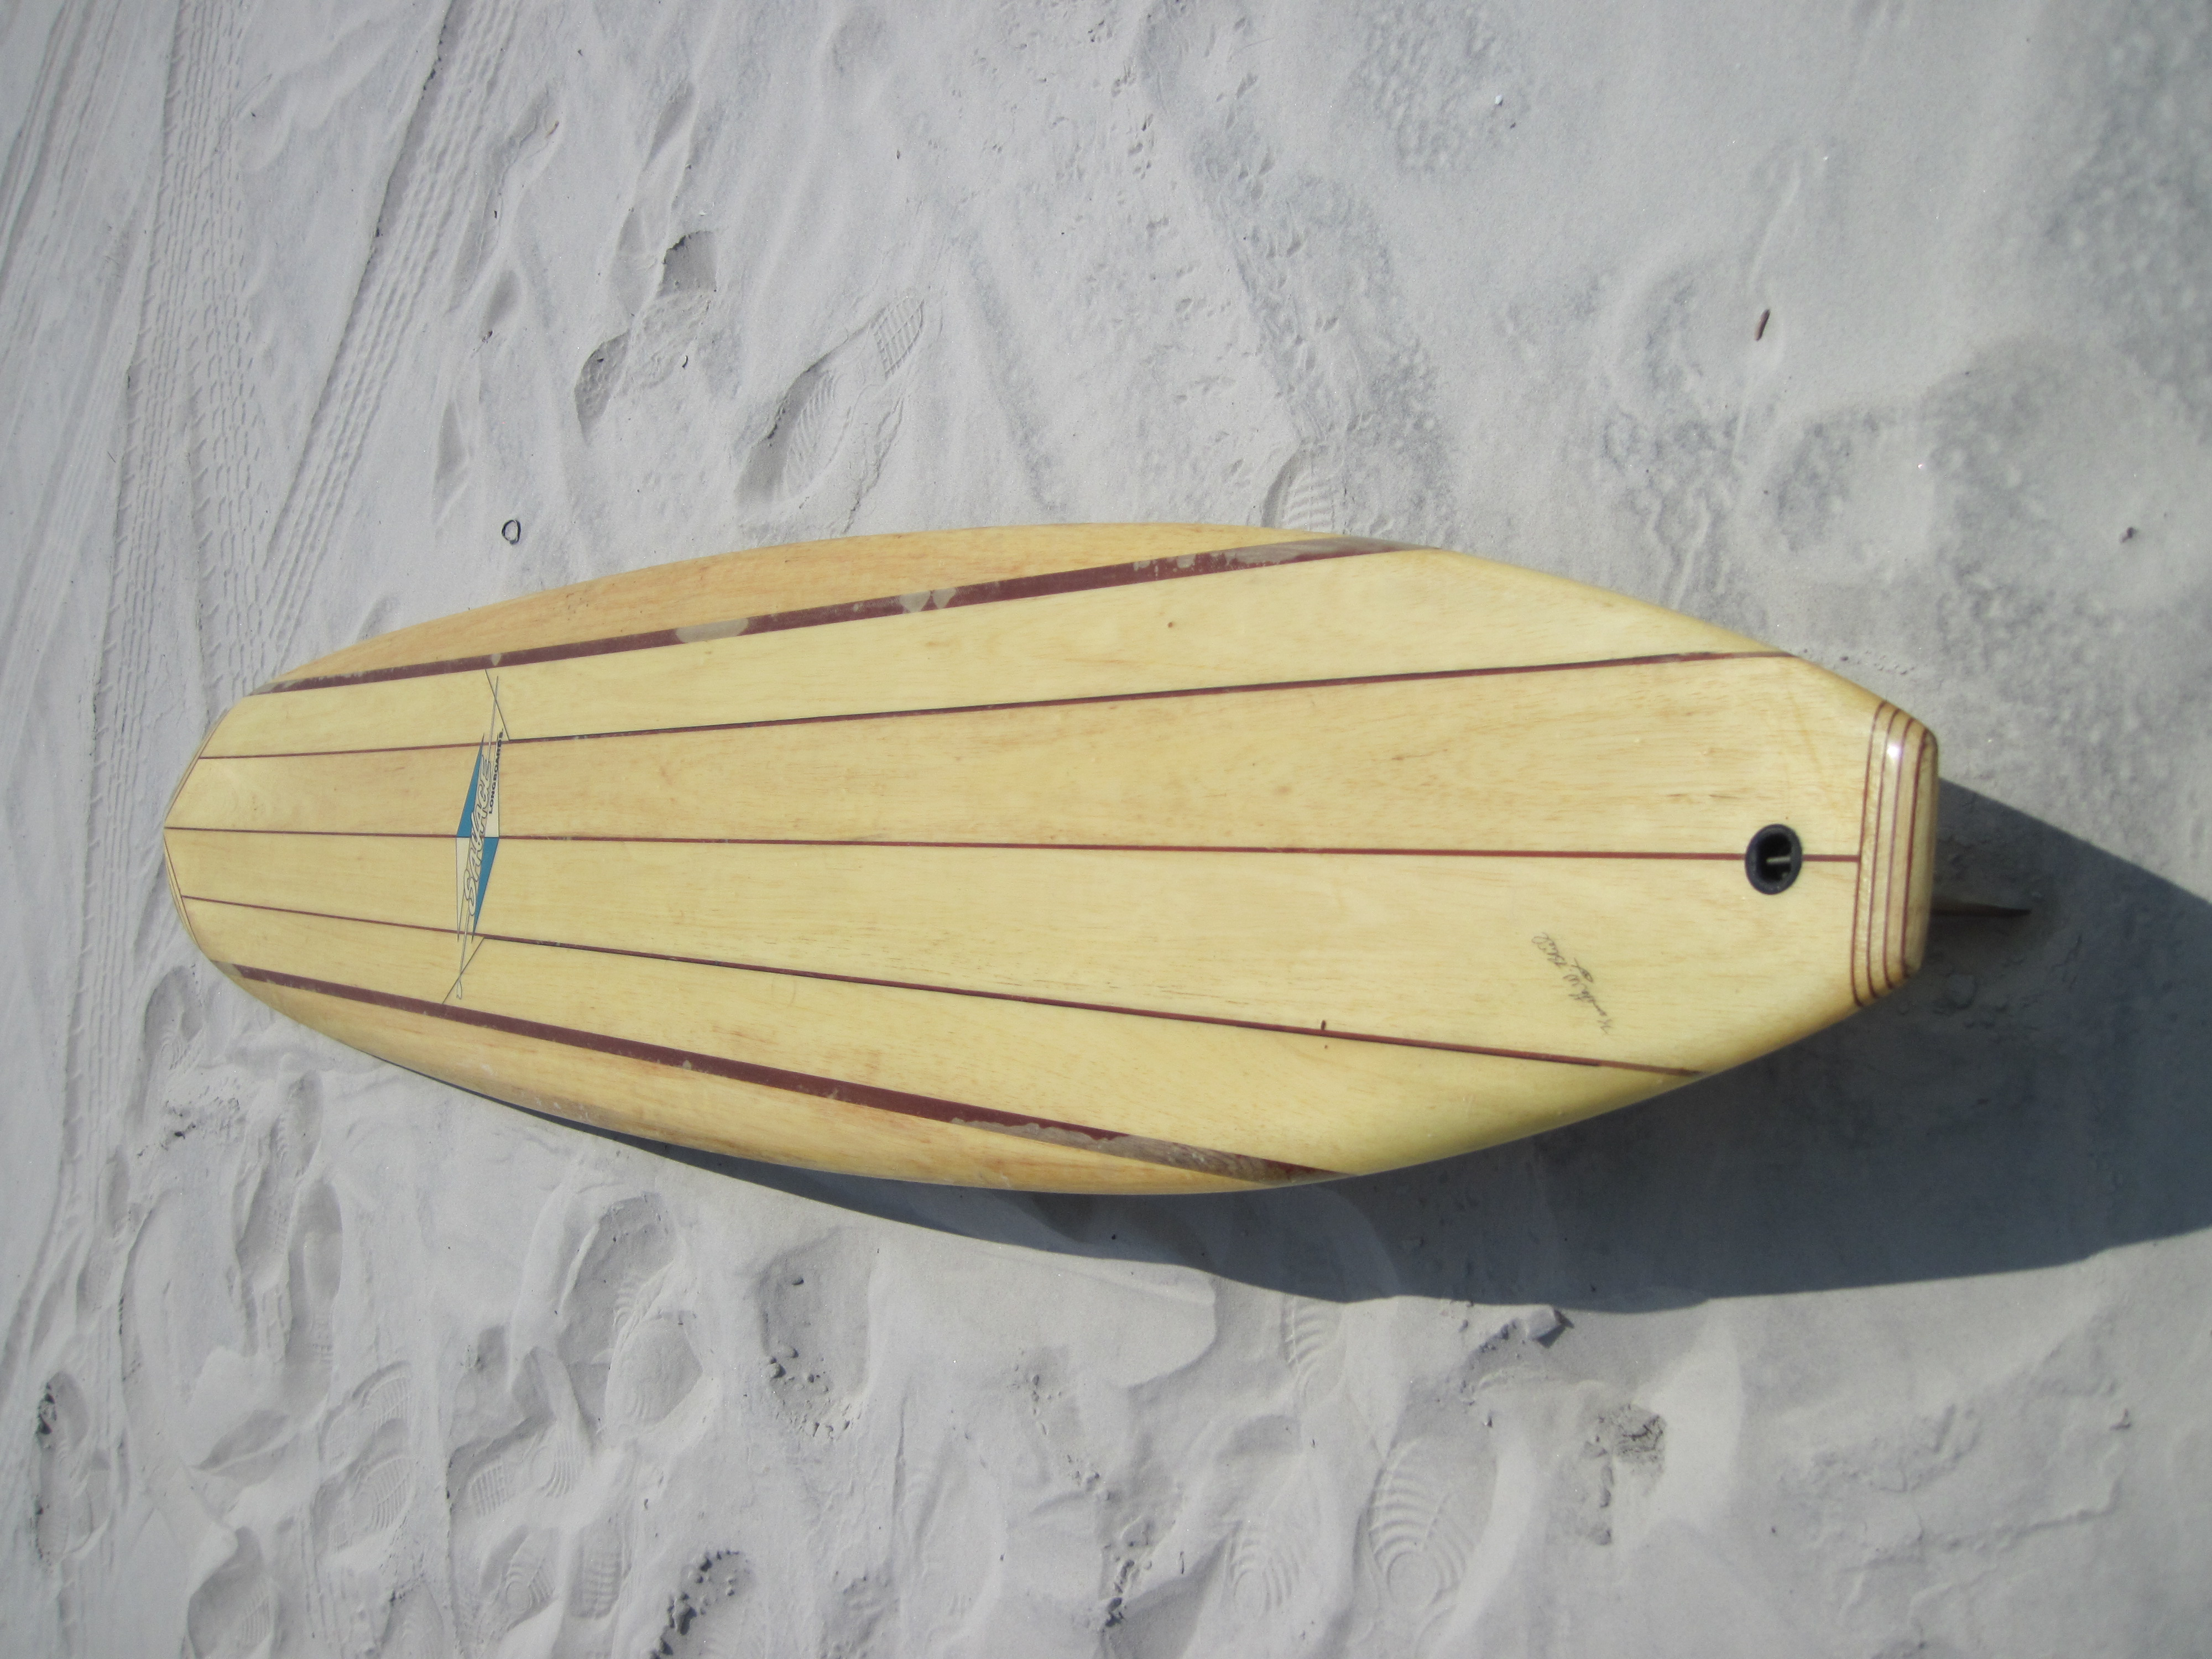 Balsa Wood Longboard- Surf Station Surf Report